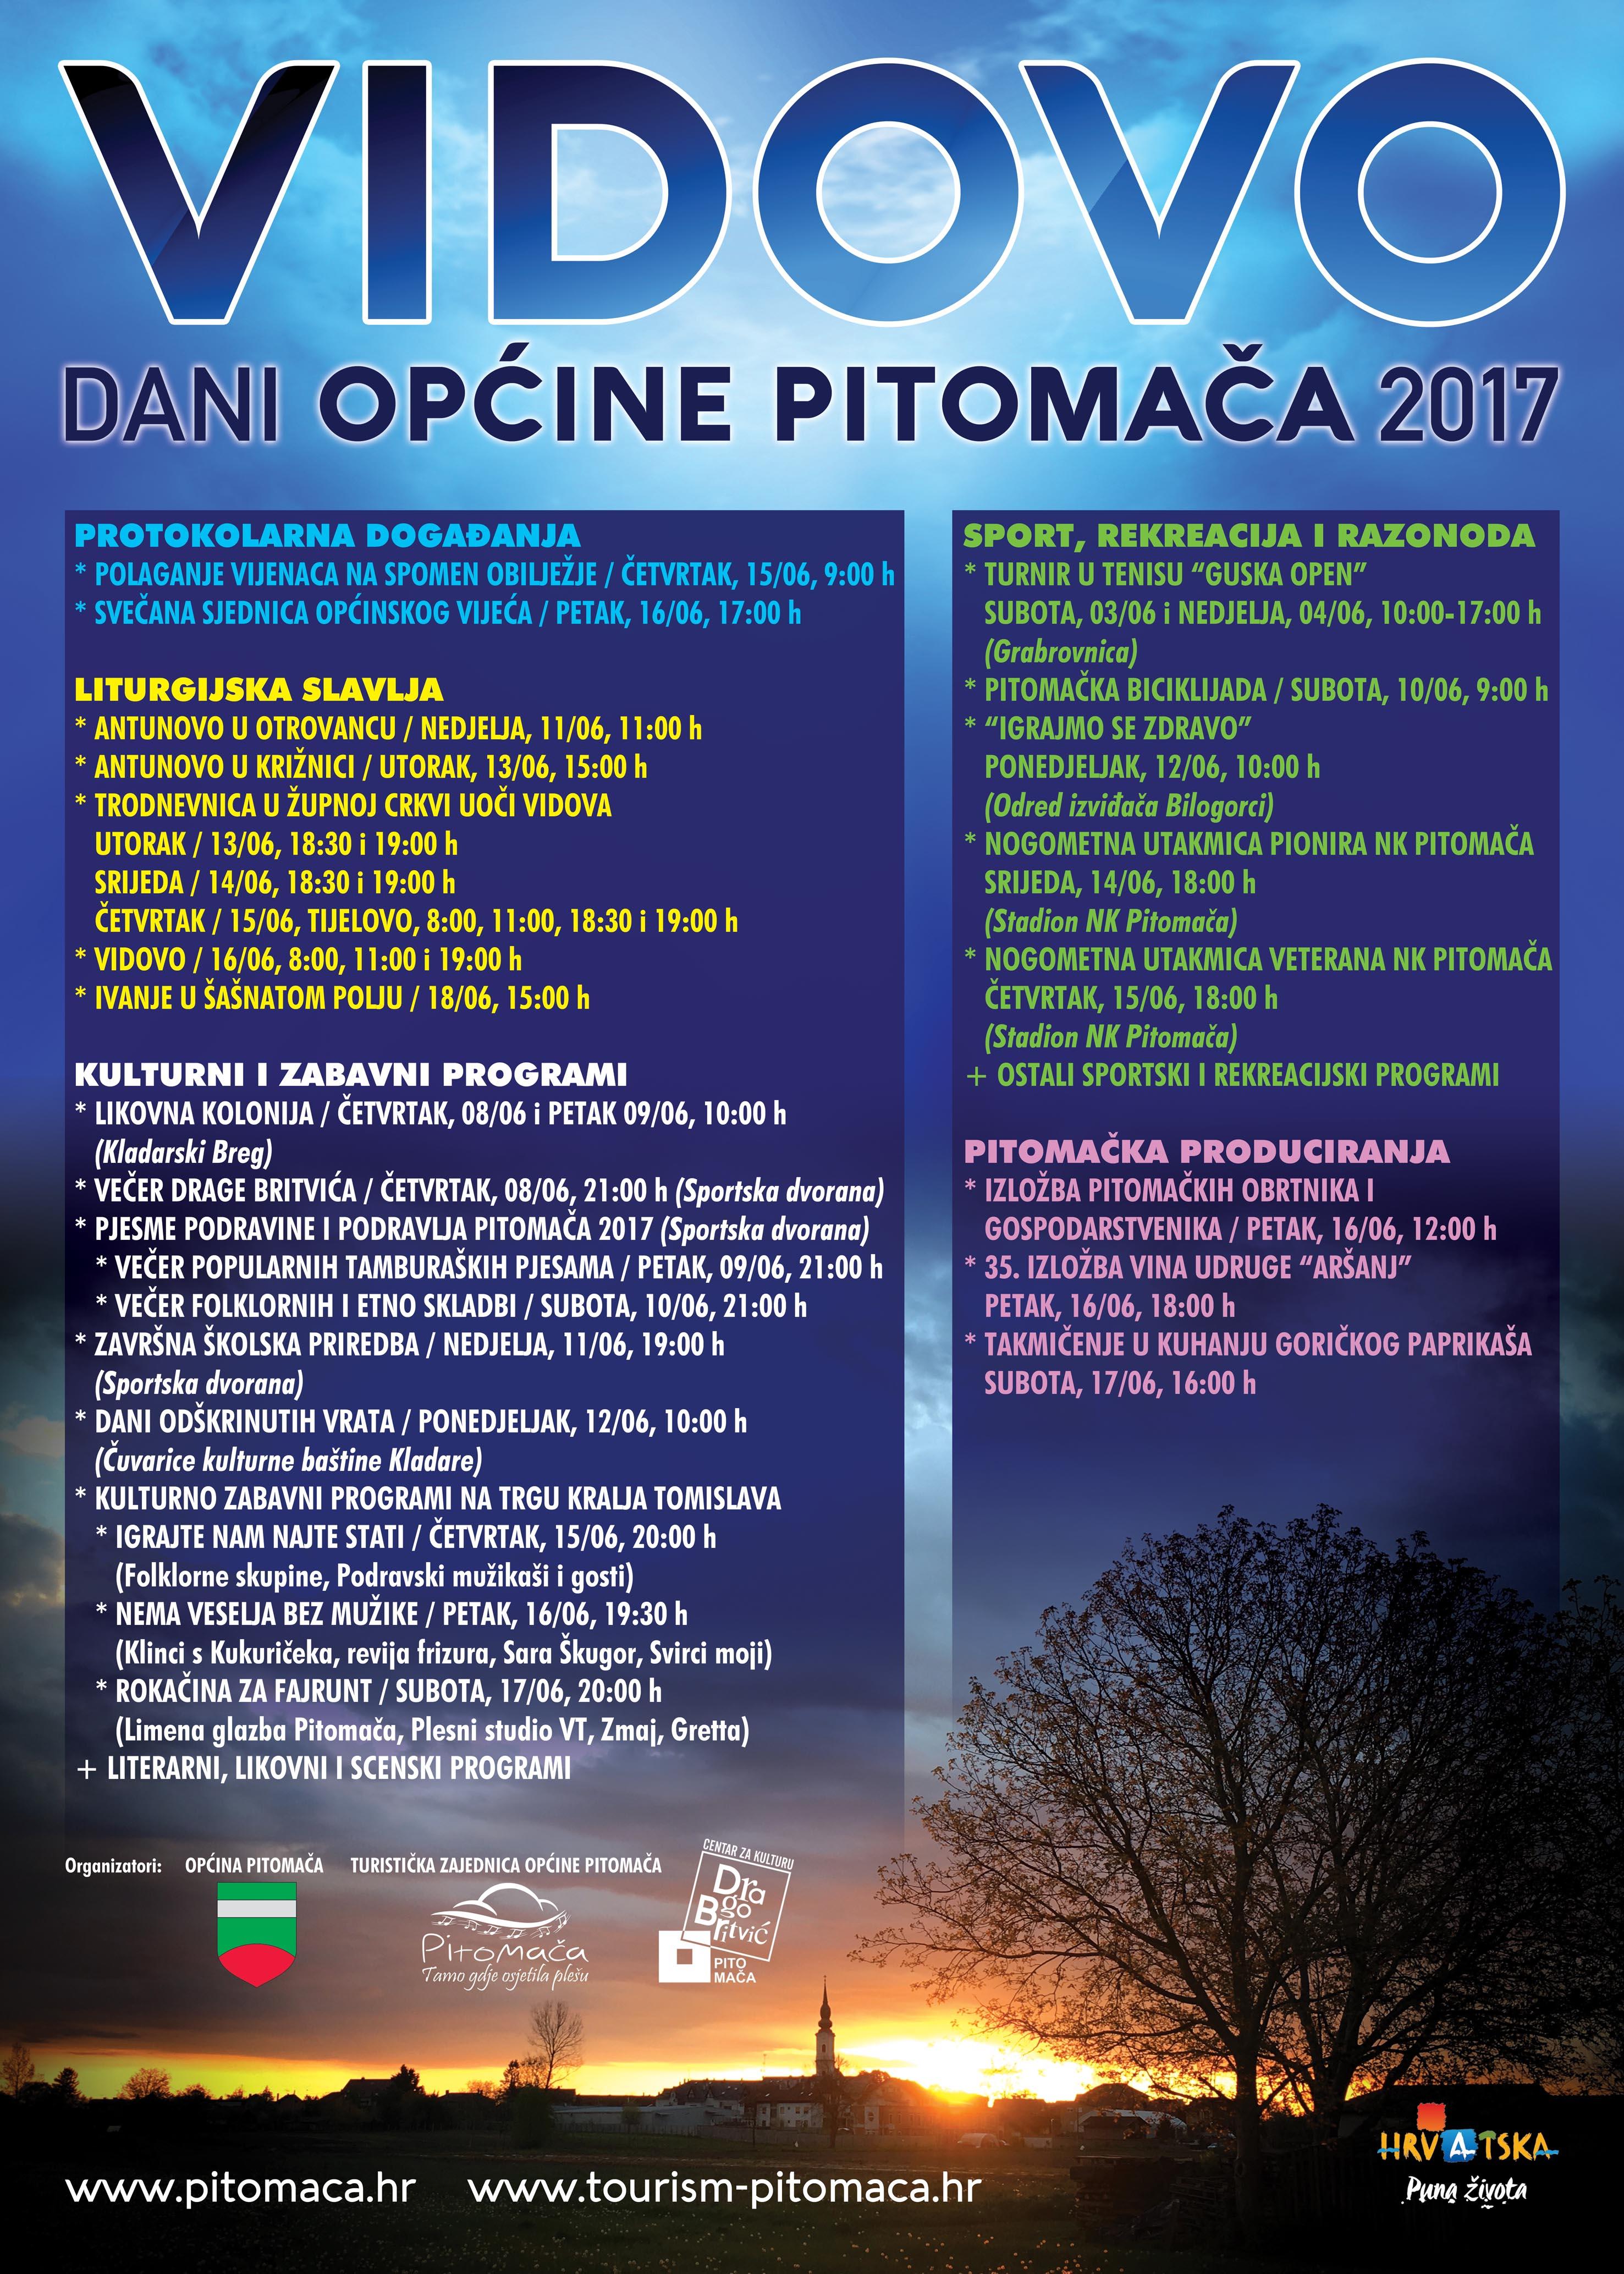 vidovo-2017-plakat-b2